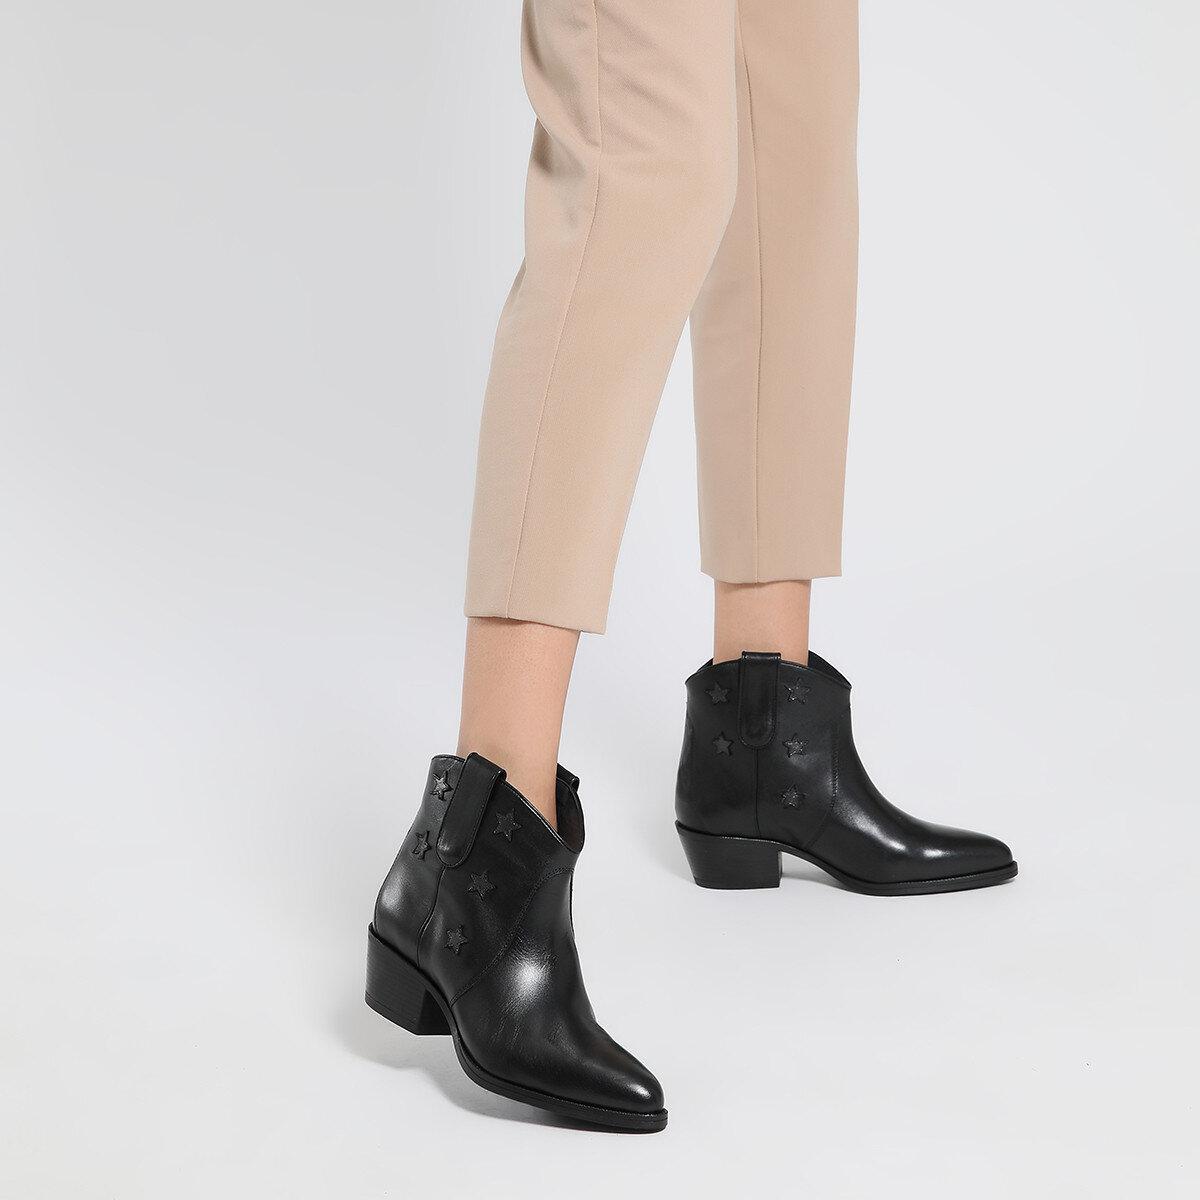 CUHAV Siyah Kadın Topuklu Bot